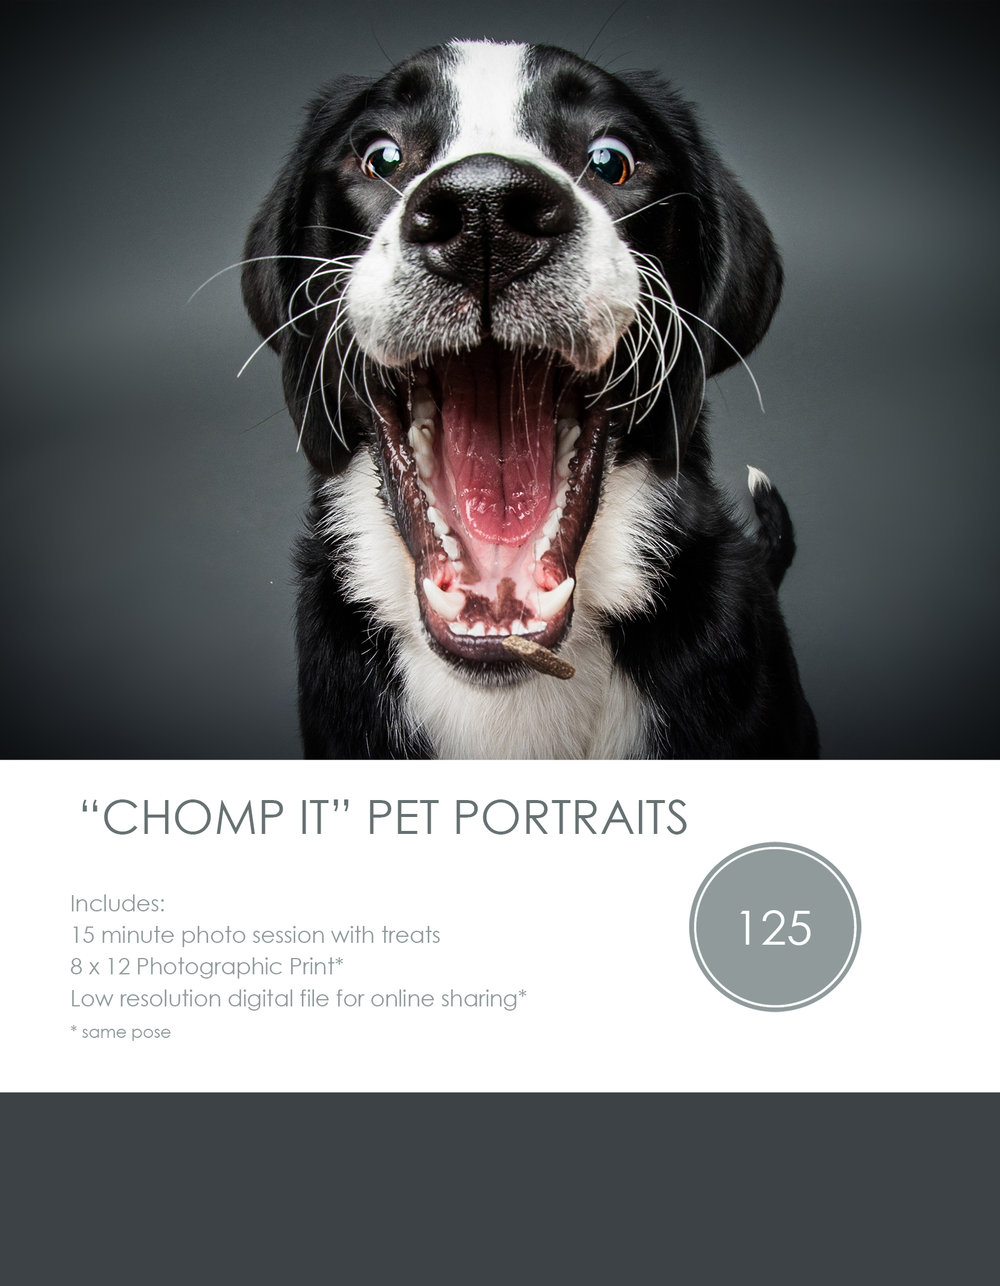 pet portrait of a dog catching a treat